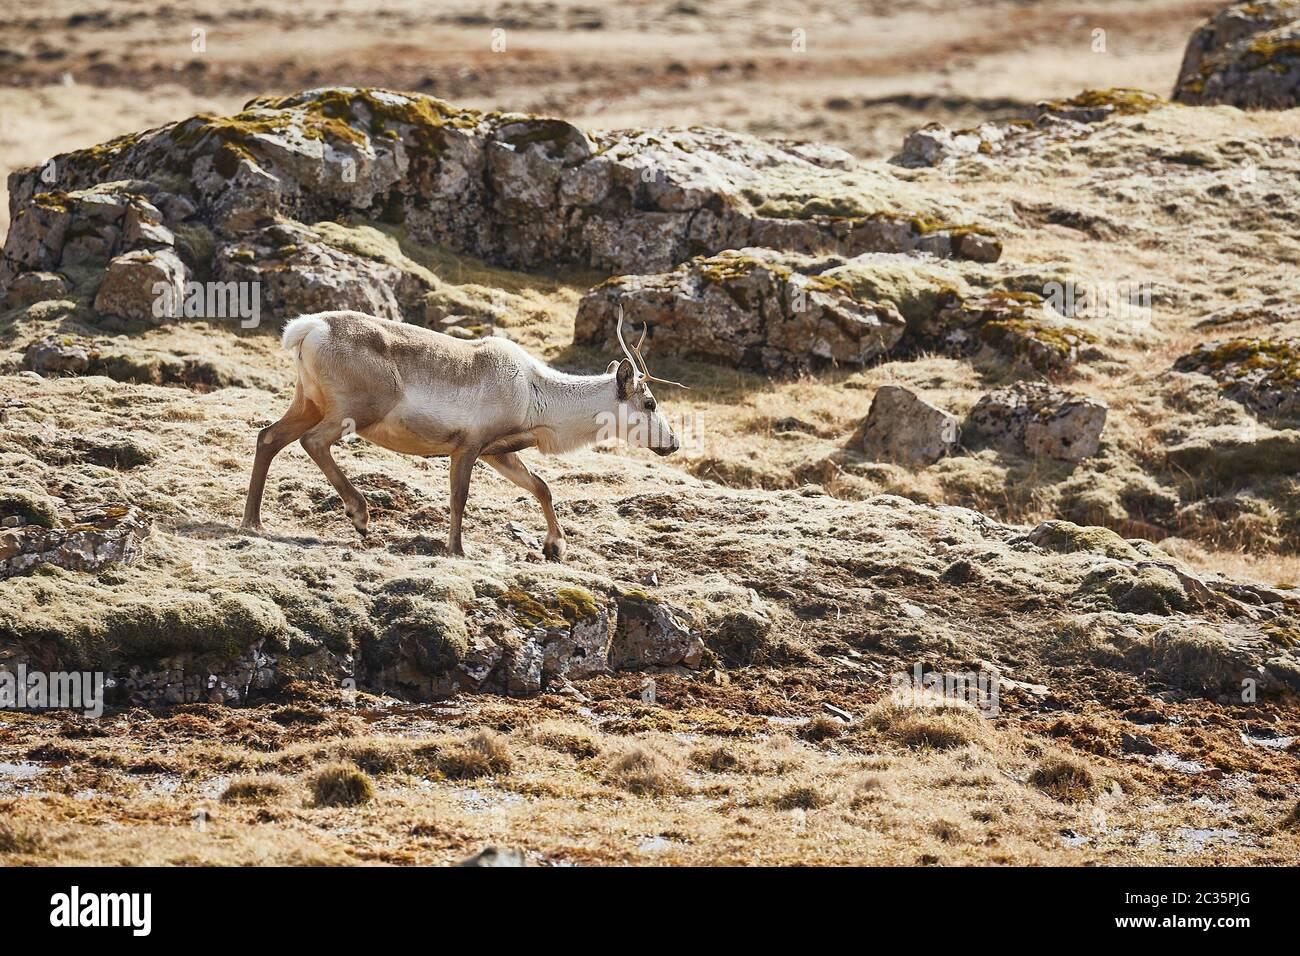 Reindeer in Eastern Iceland, walking the rocky landscape Stock Photo